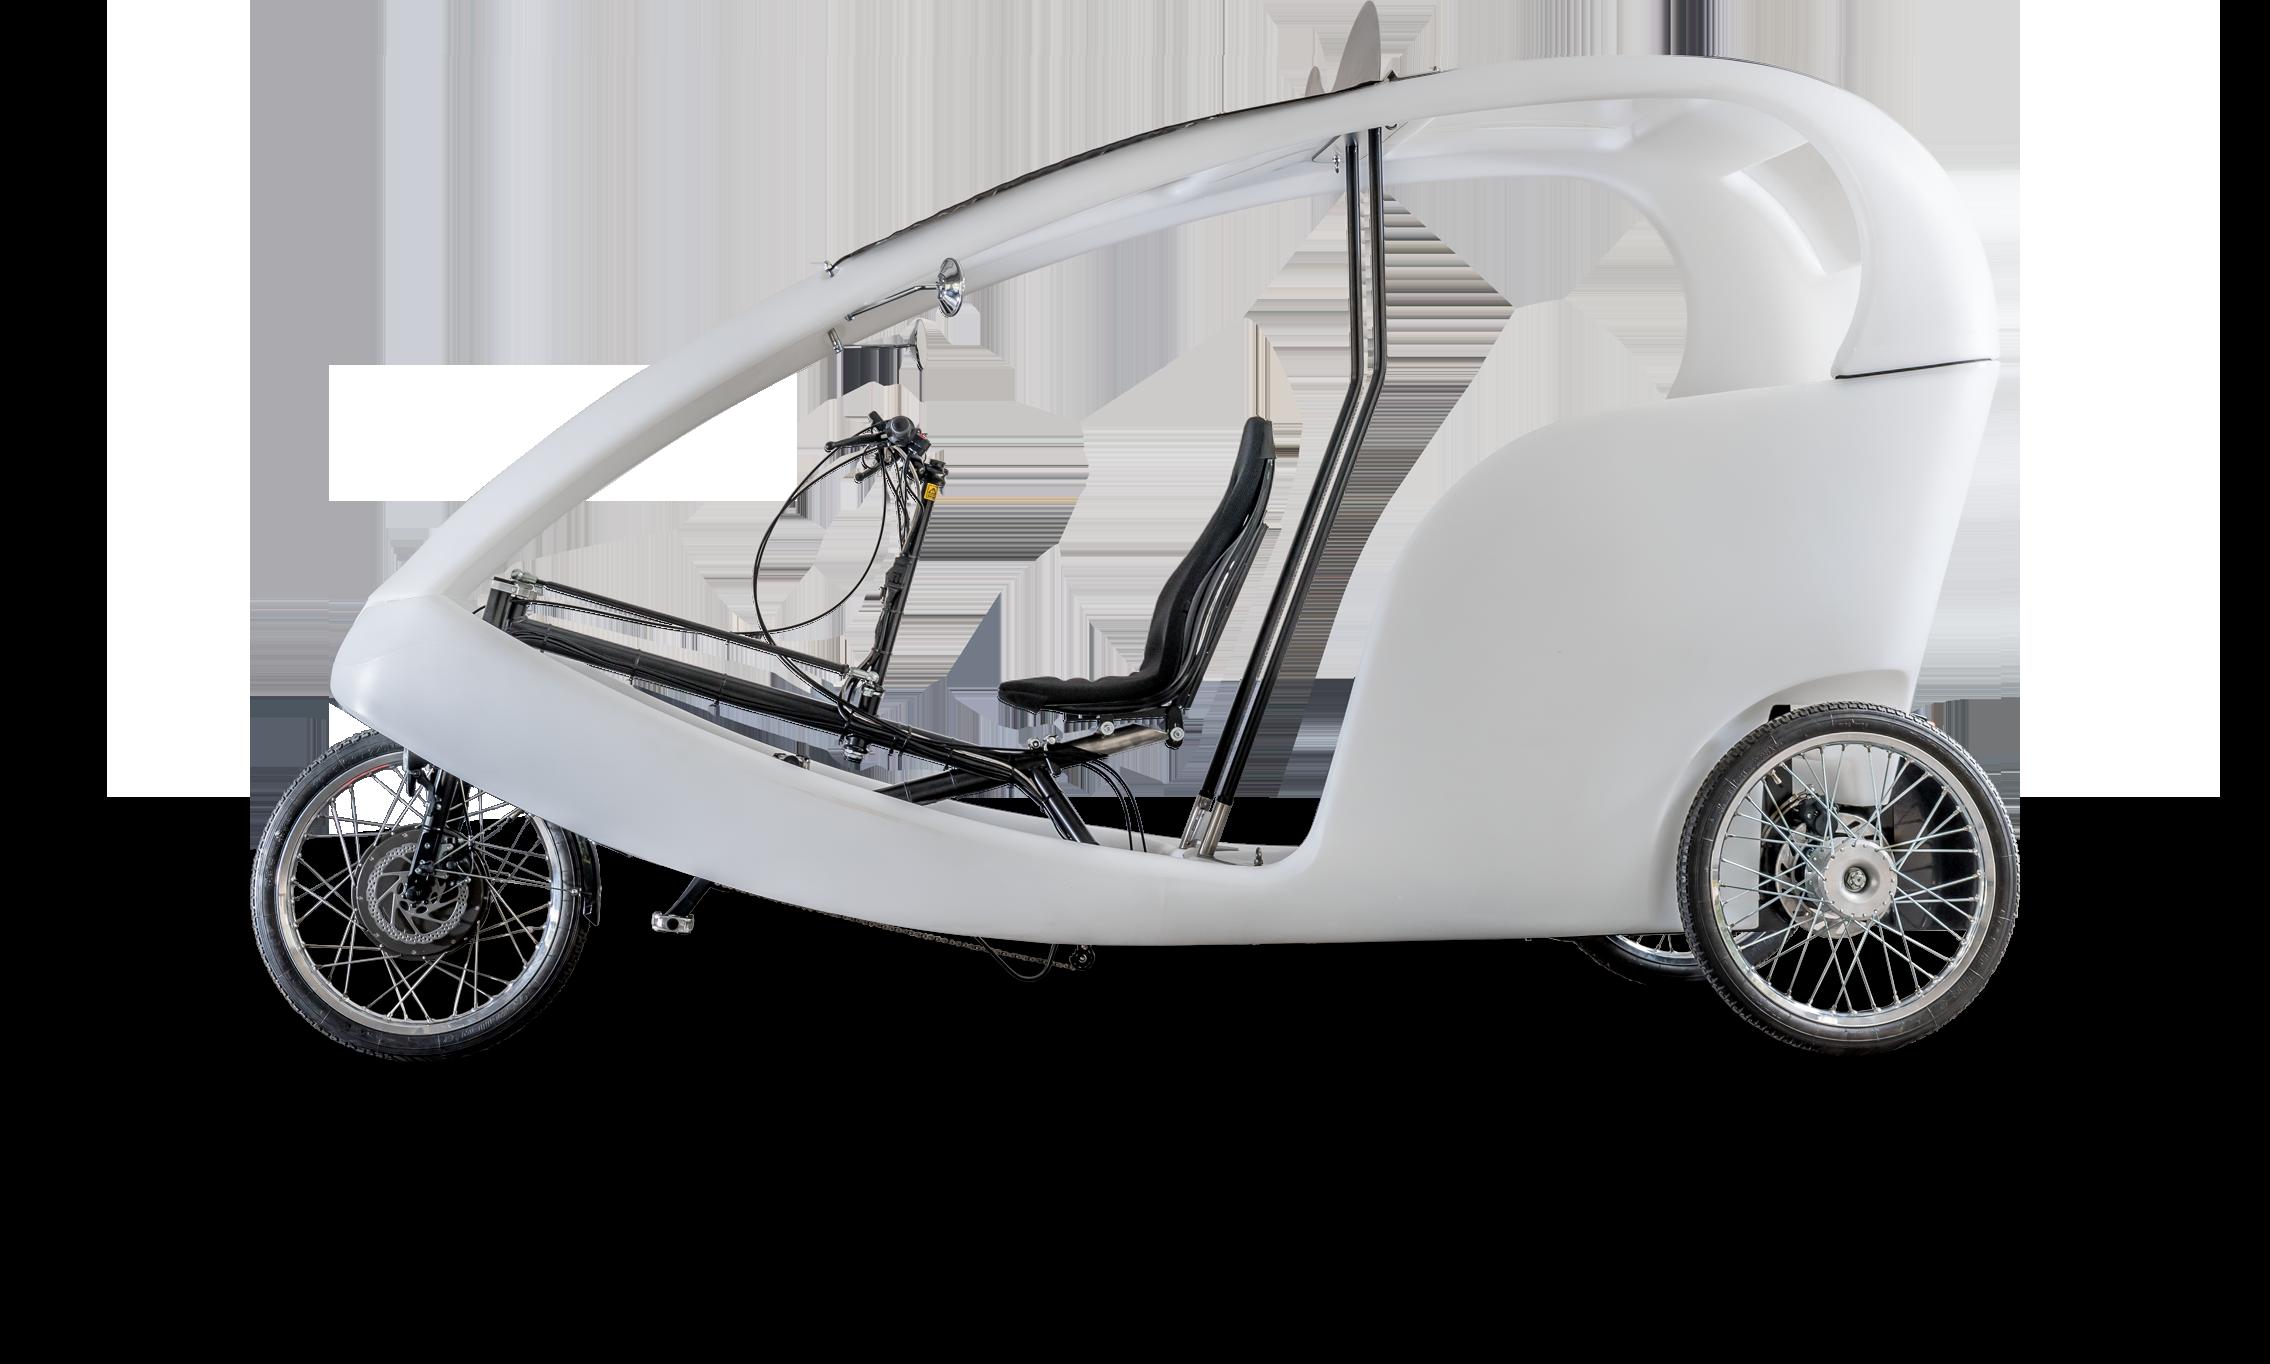 CRUISER - DAS VELOTAXI SINGLE MOTOR DRIVE 48V 250W 100 Nm / Nabenmotor im Vorderrad CargoPower